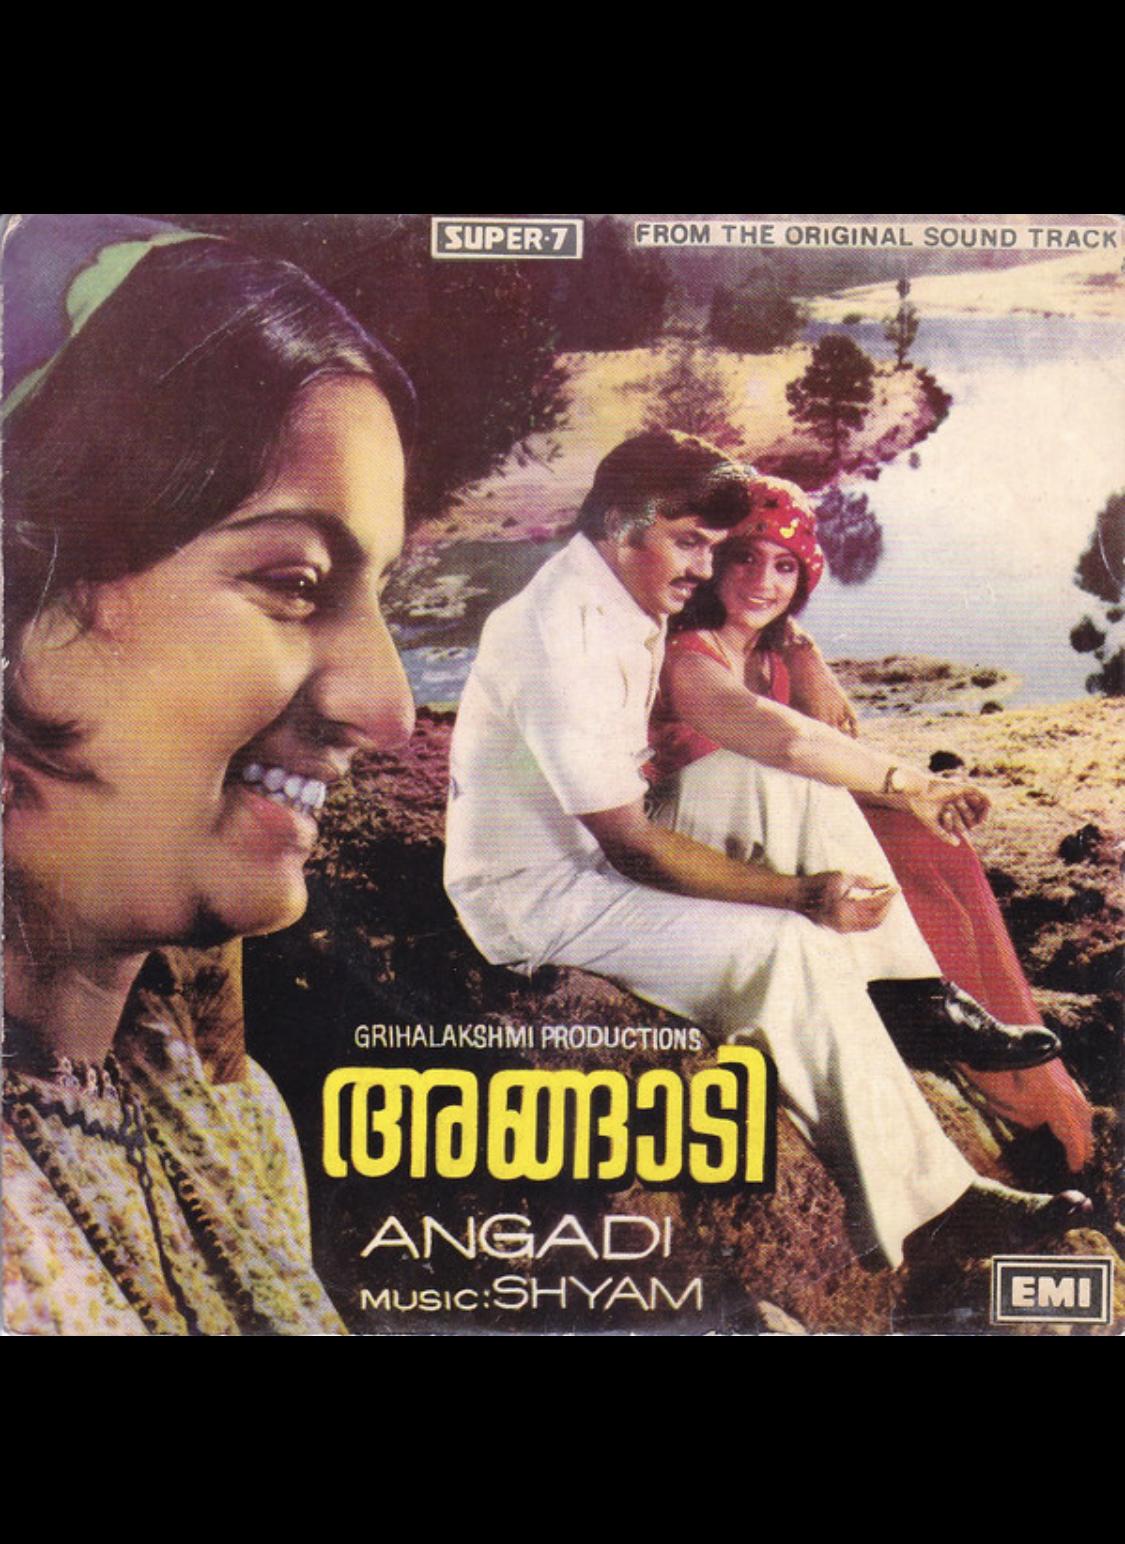 Angaadi ((1980))